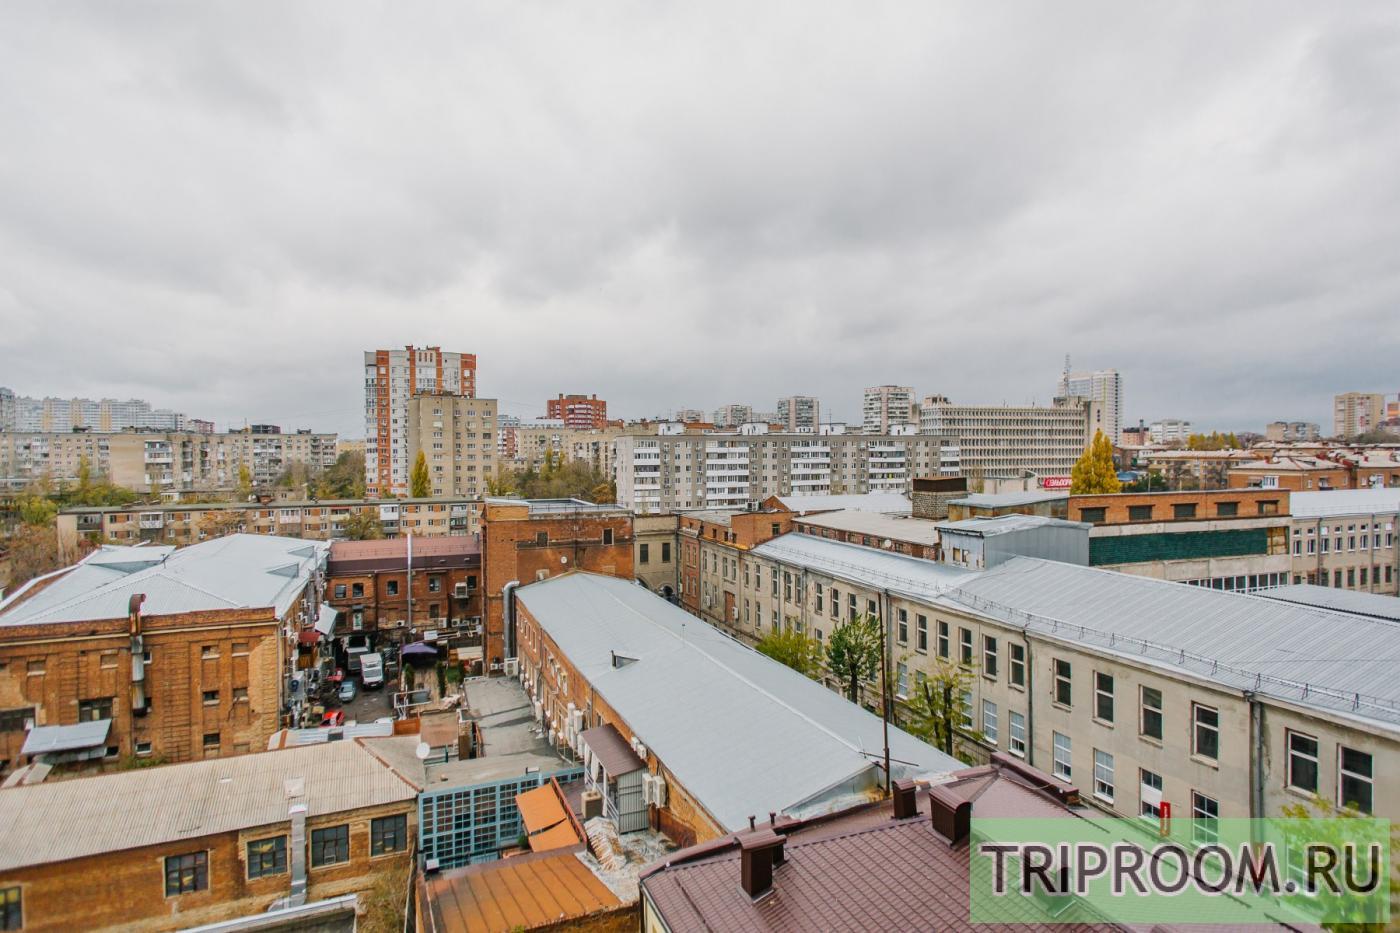 2-комнатная квартира посуточно (вариант № 23730), ул. Максима Горького улица, фото № 17